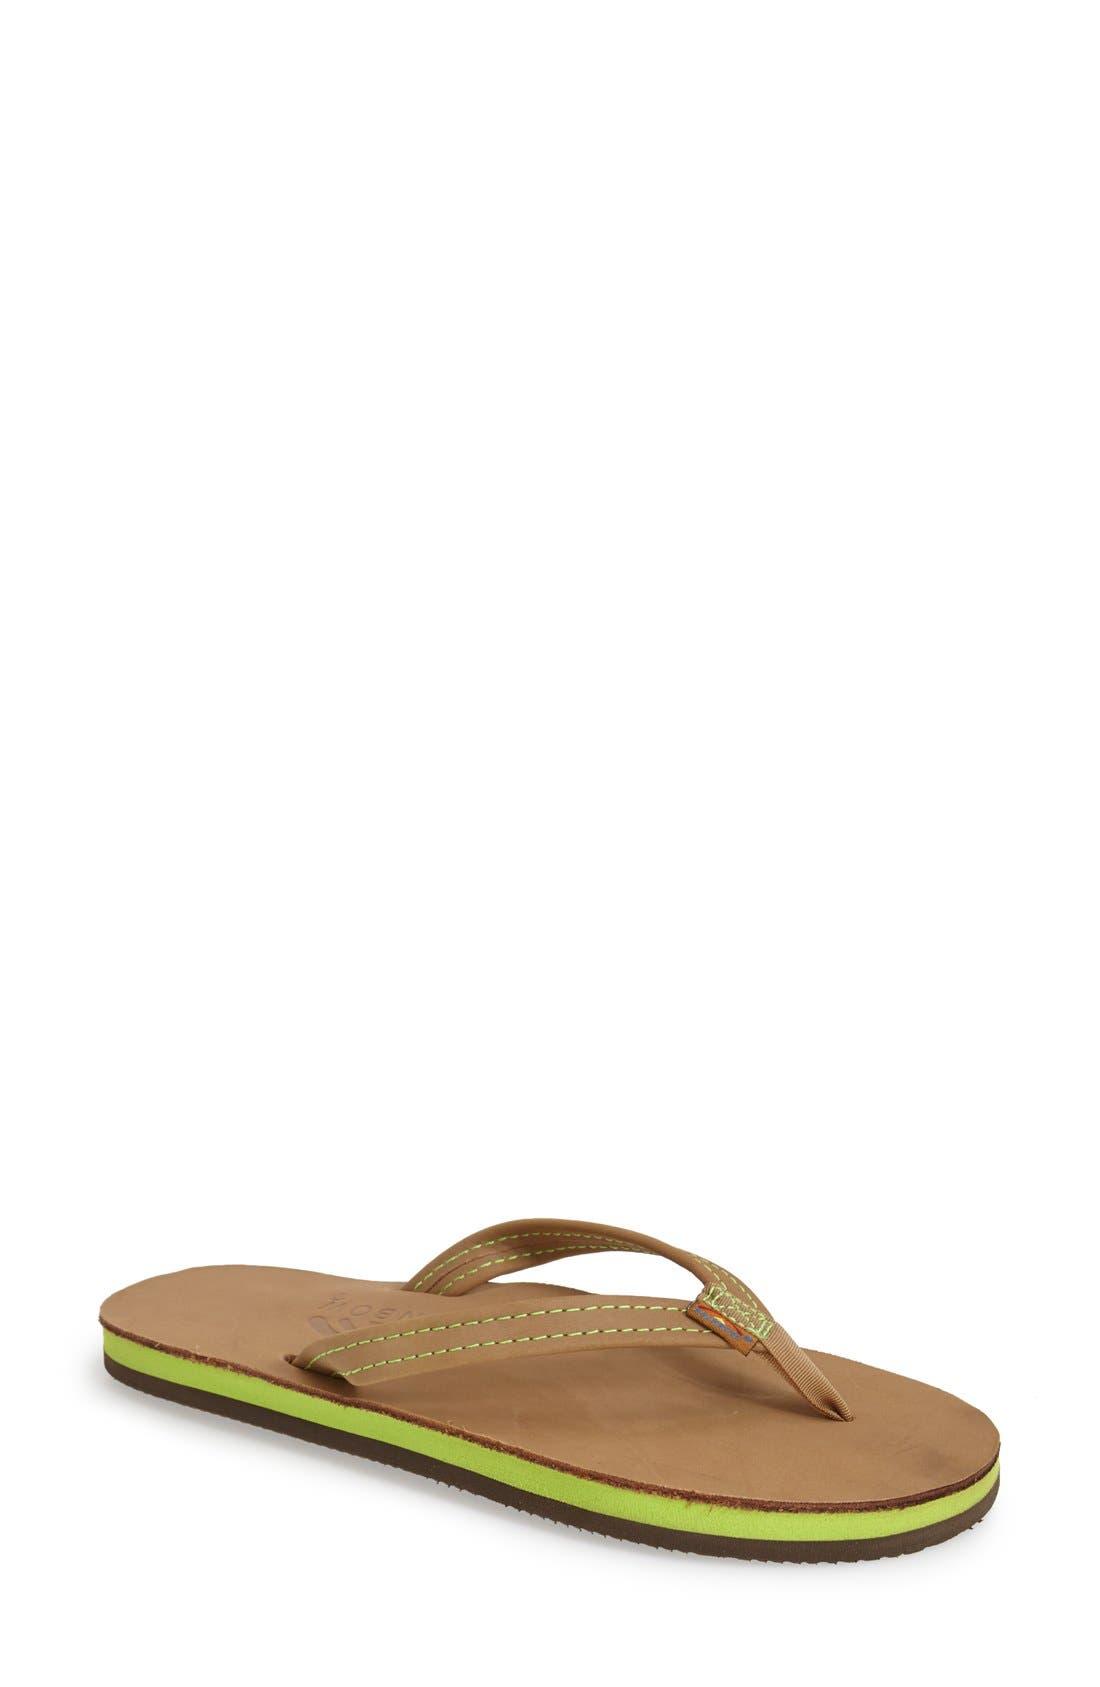 Main Image - Rainbow Double Layer Thong Sandal (Women)